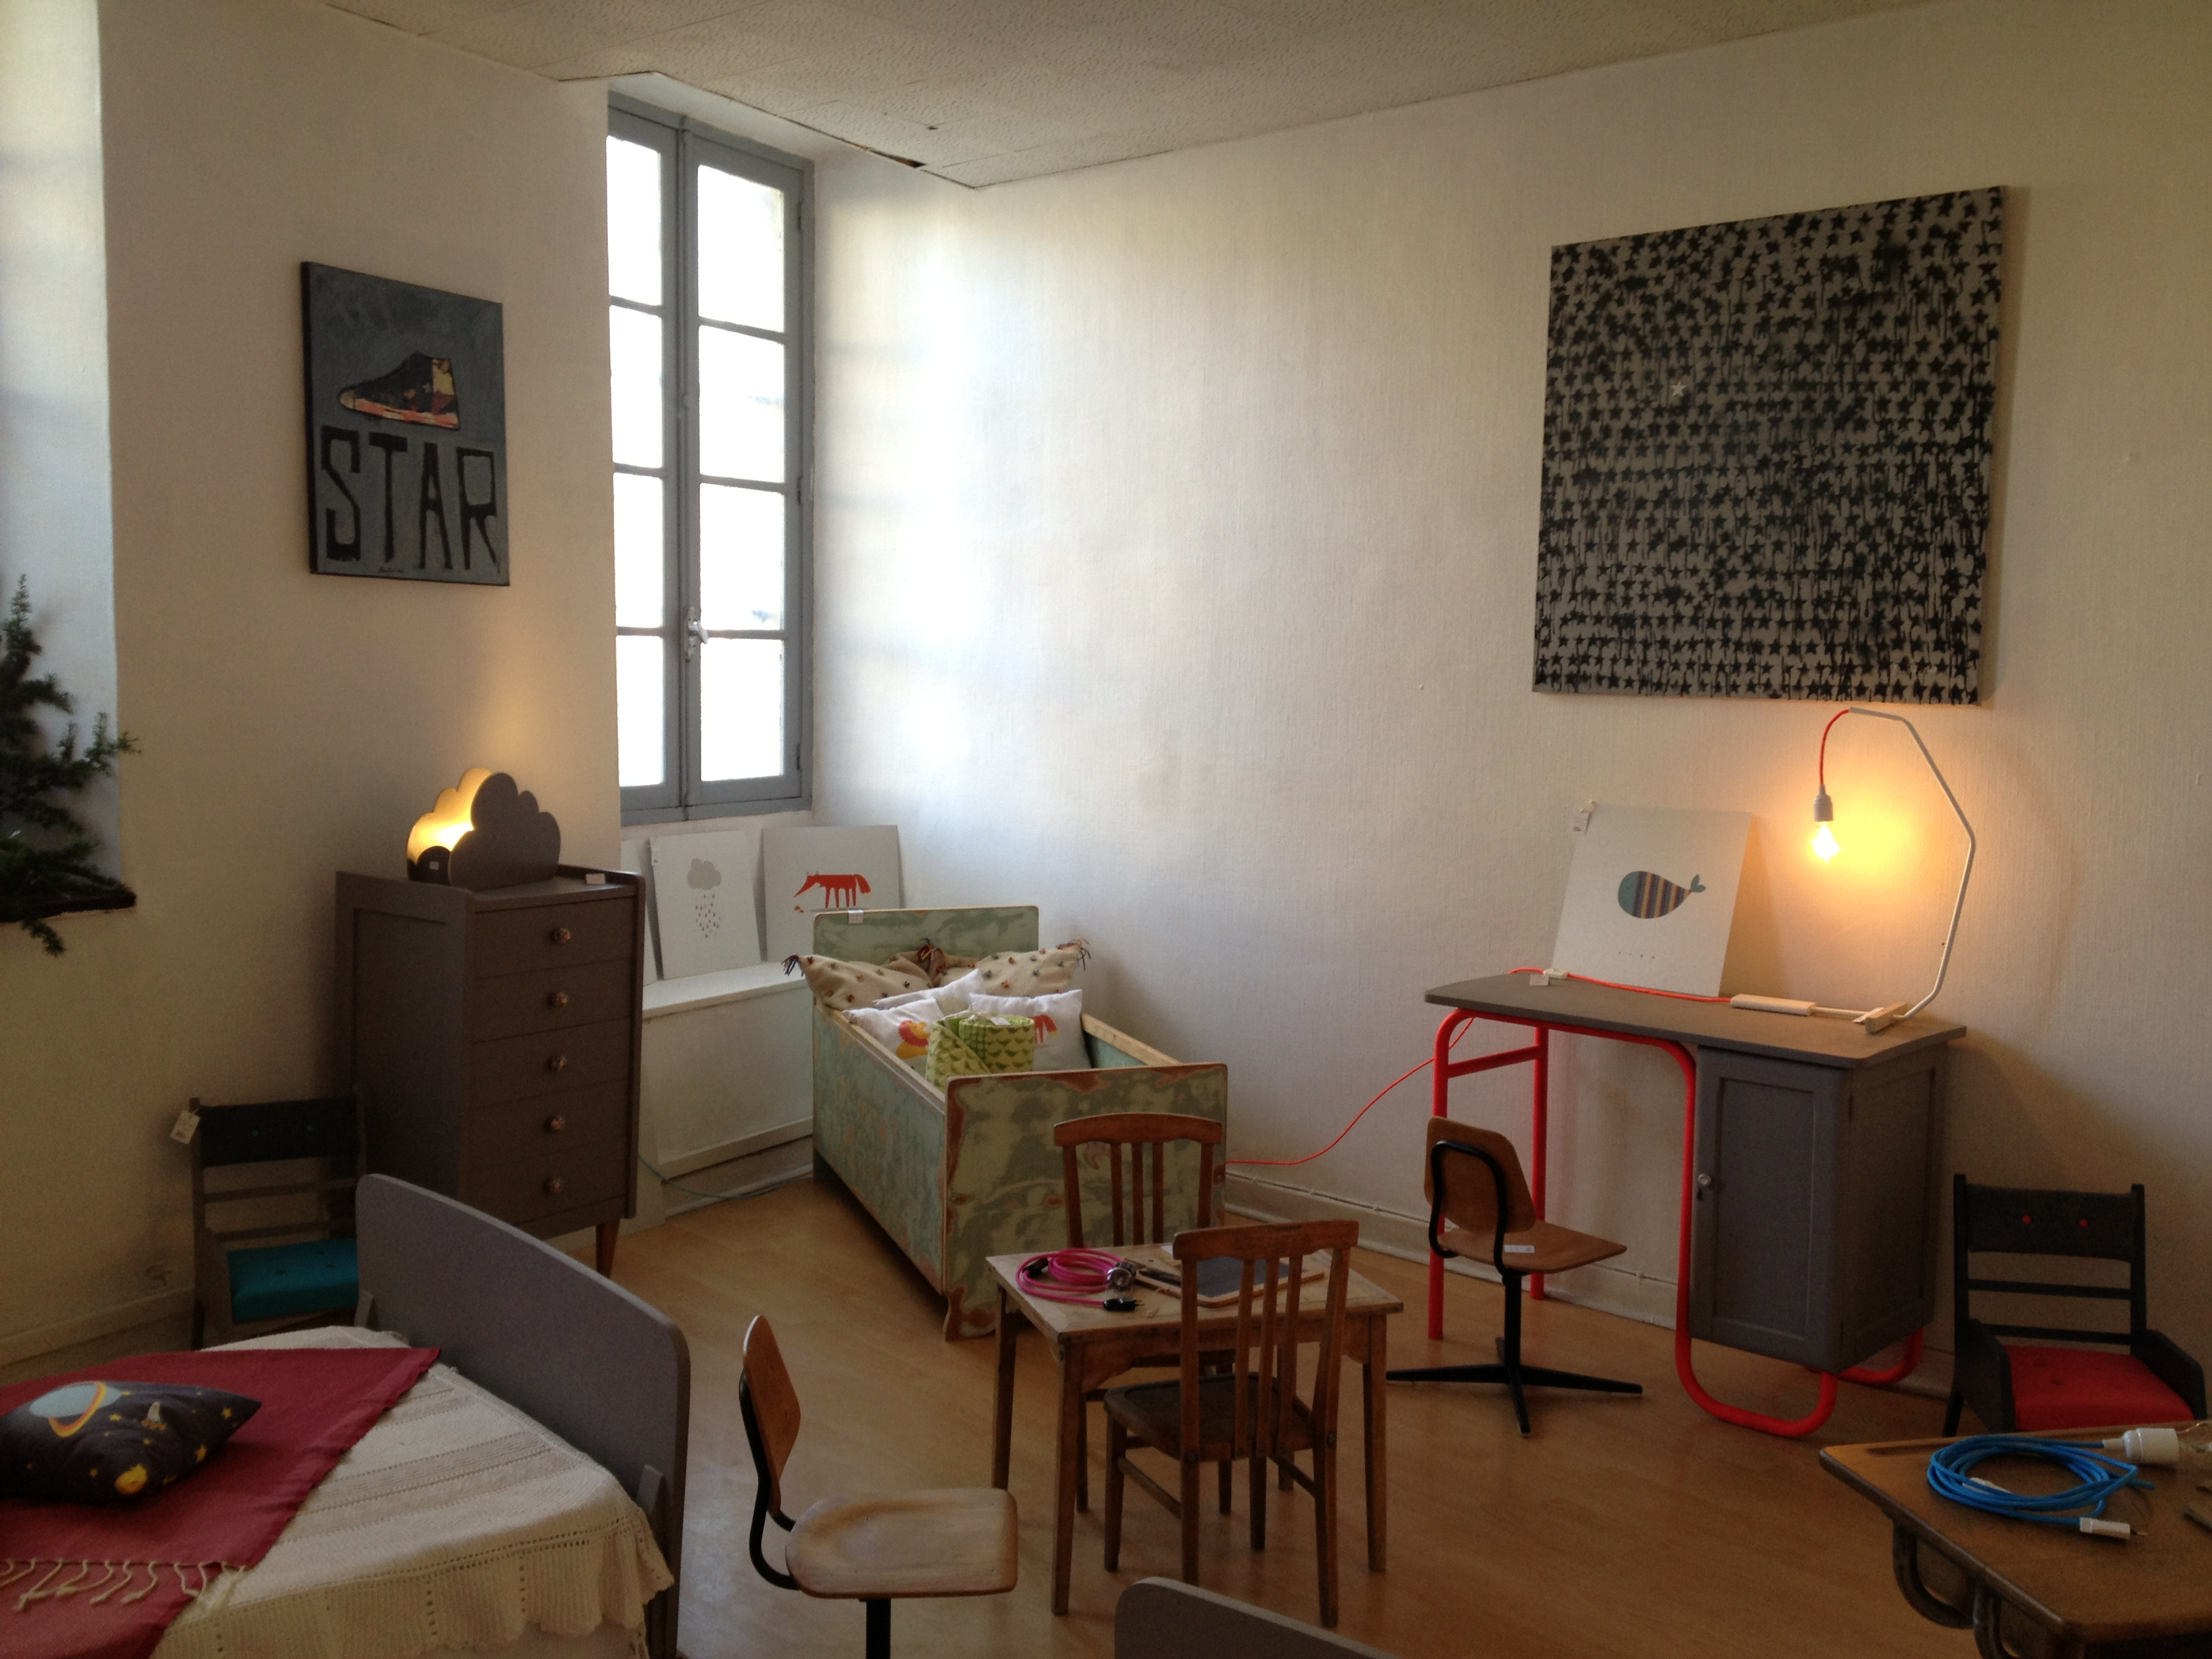 chambre enfant vintage r tro boutique. Black Bedroom Furniture Sets. Home Design Ideas